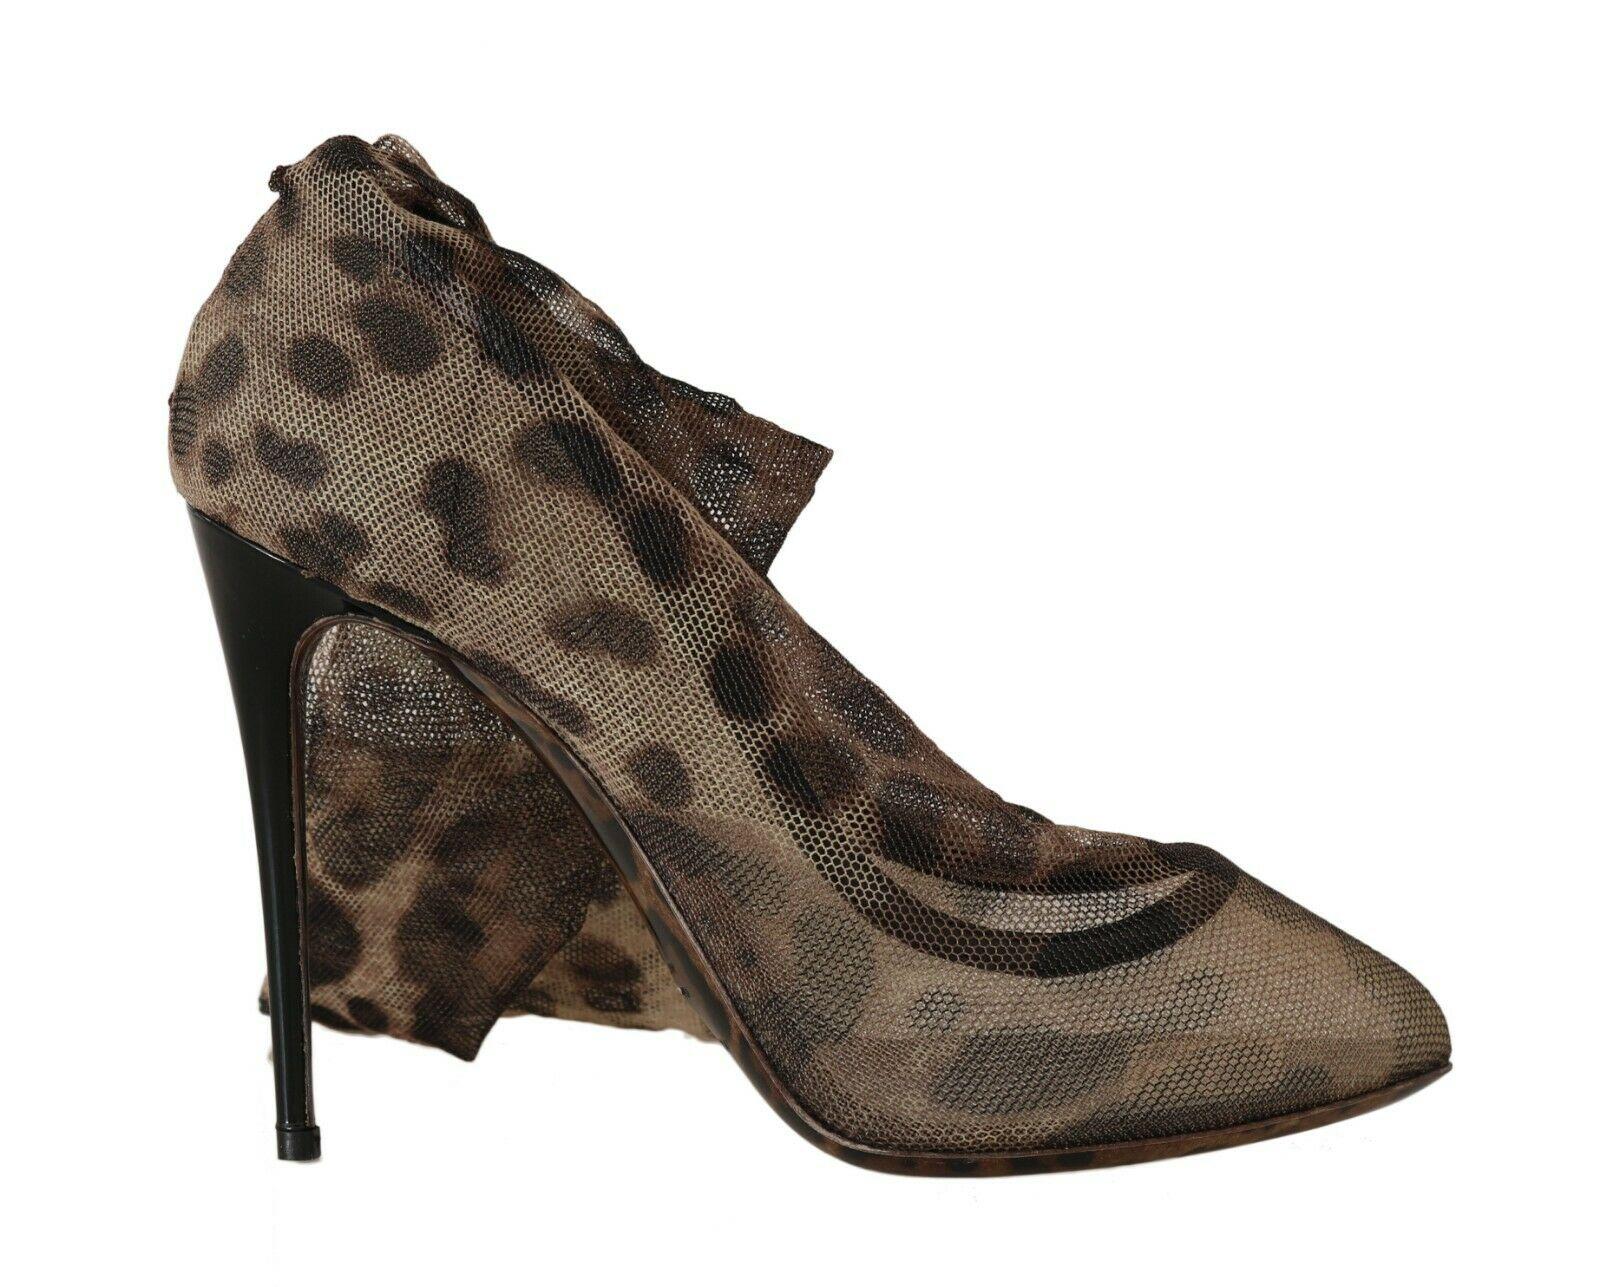 Dolce & Gabbana Women's Leopard Tulle Long Socks Pumps Shoes Brown LA6133 - EU38/US7.5